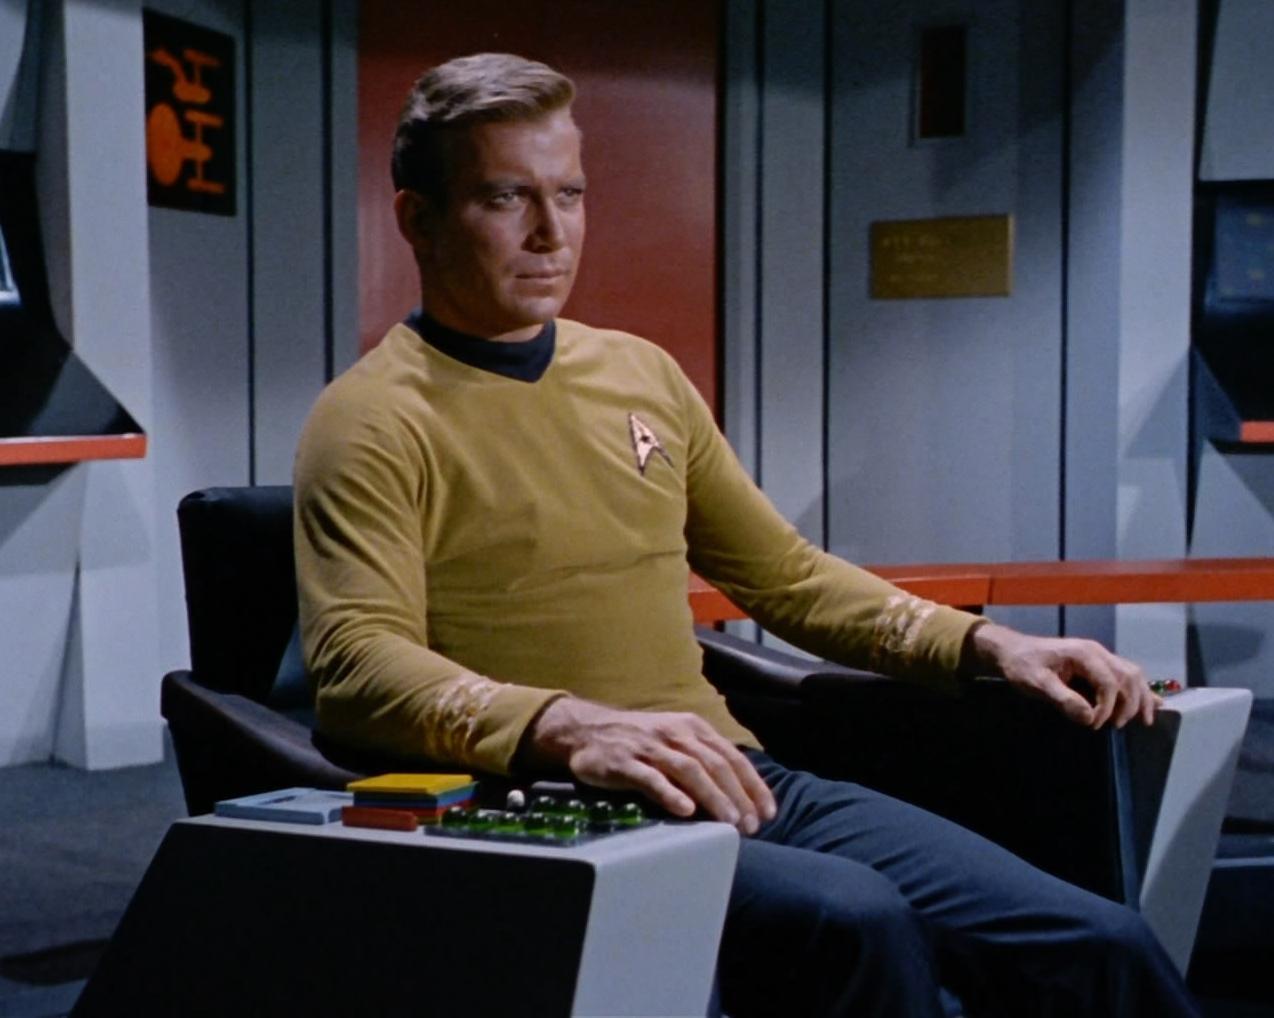 kirk_in_enterprise_command_chair.jpg